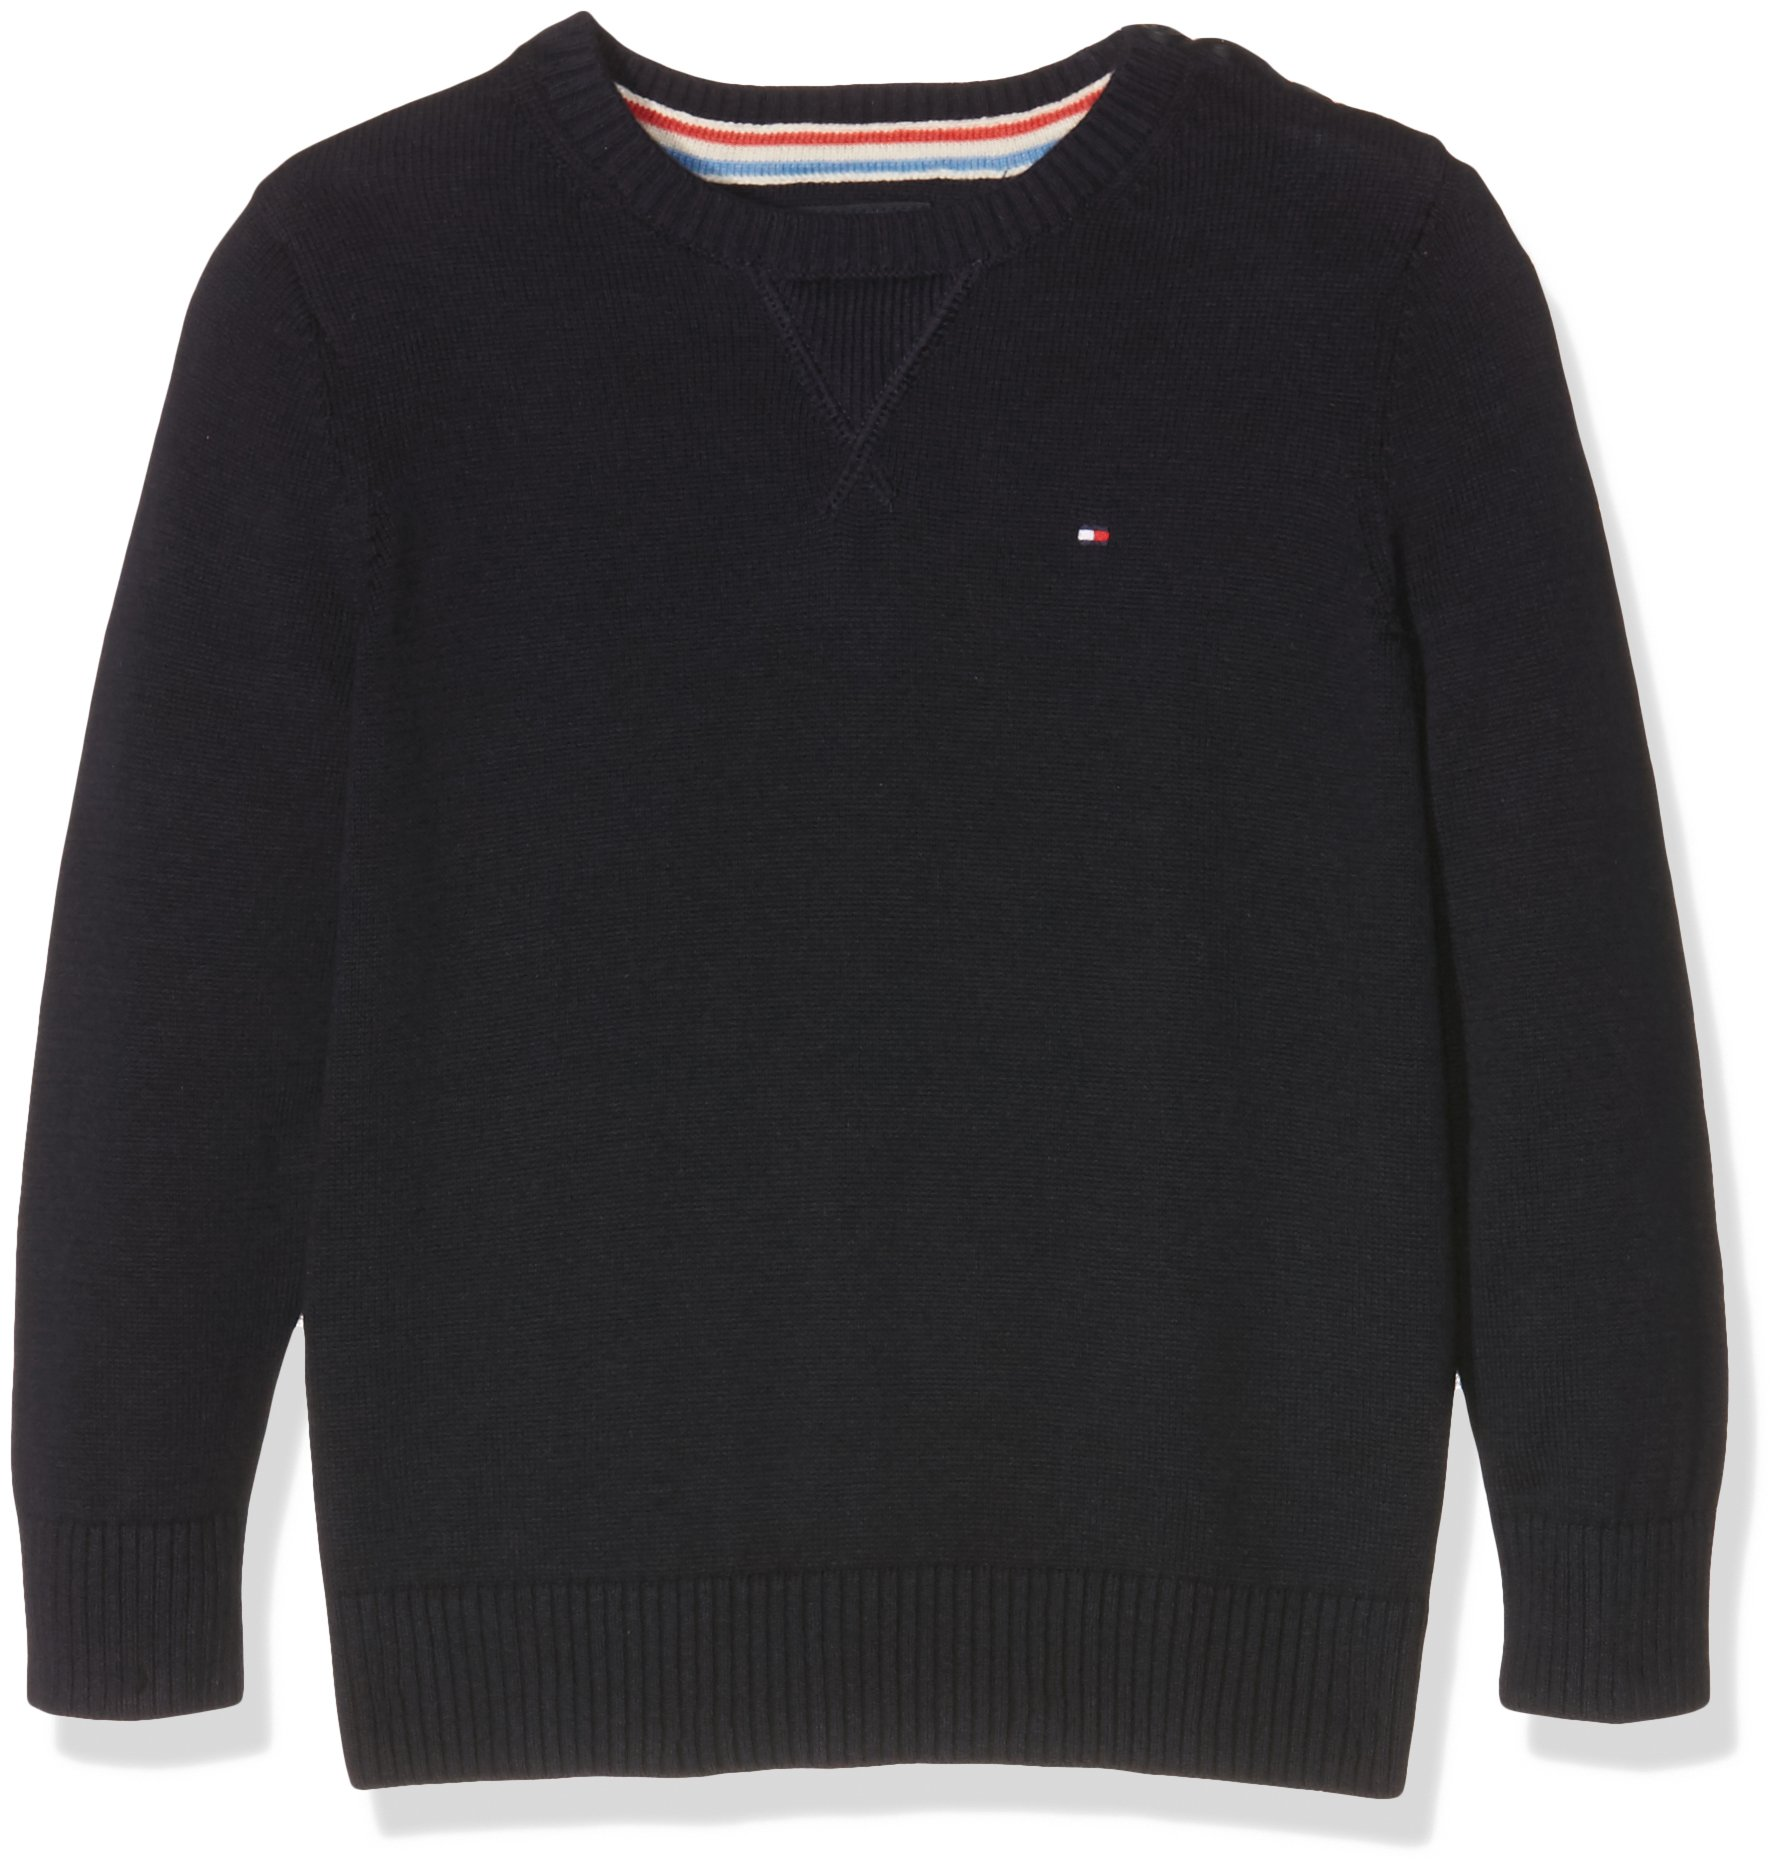 Tommy Hilfiger Basic Htr Cn Sweater L/S. Sudadera para Niños